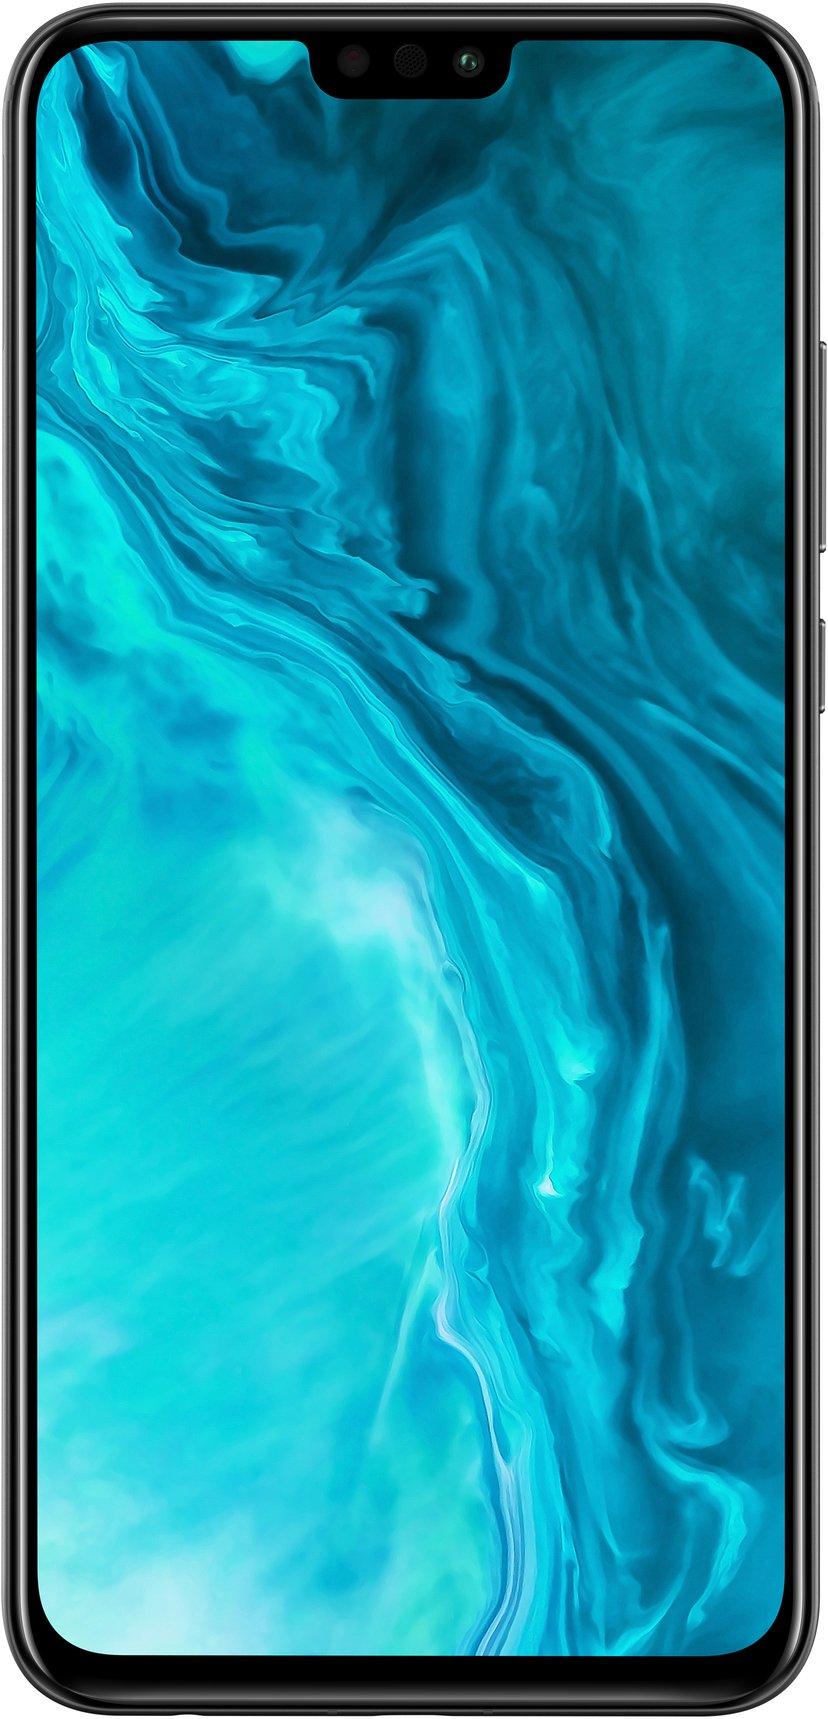 Honor 9X Lite 128GB Dobbelt-SIM Midnatts sort